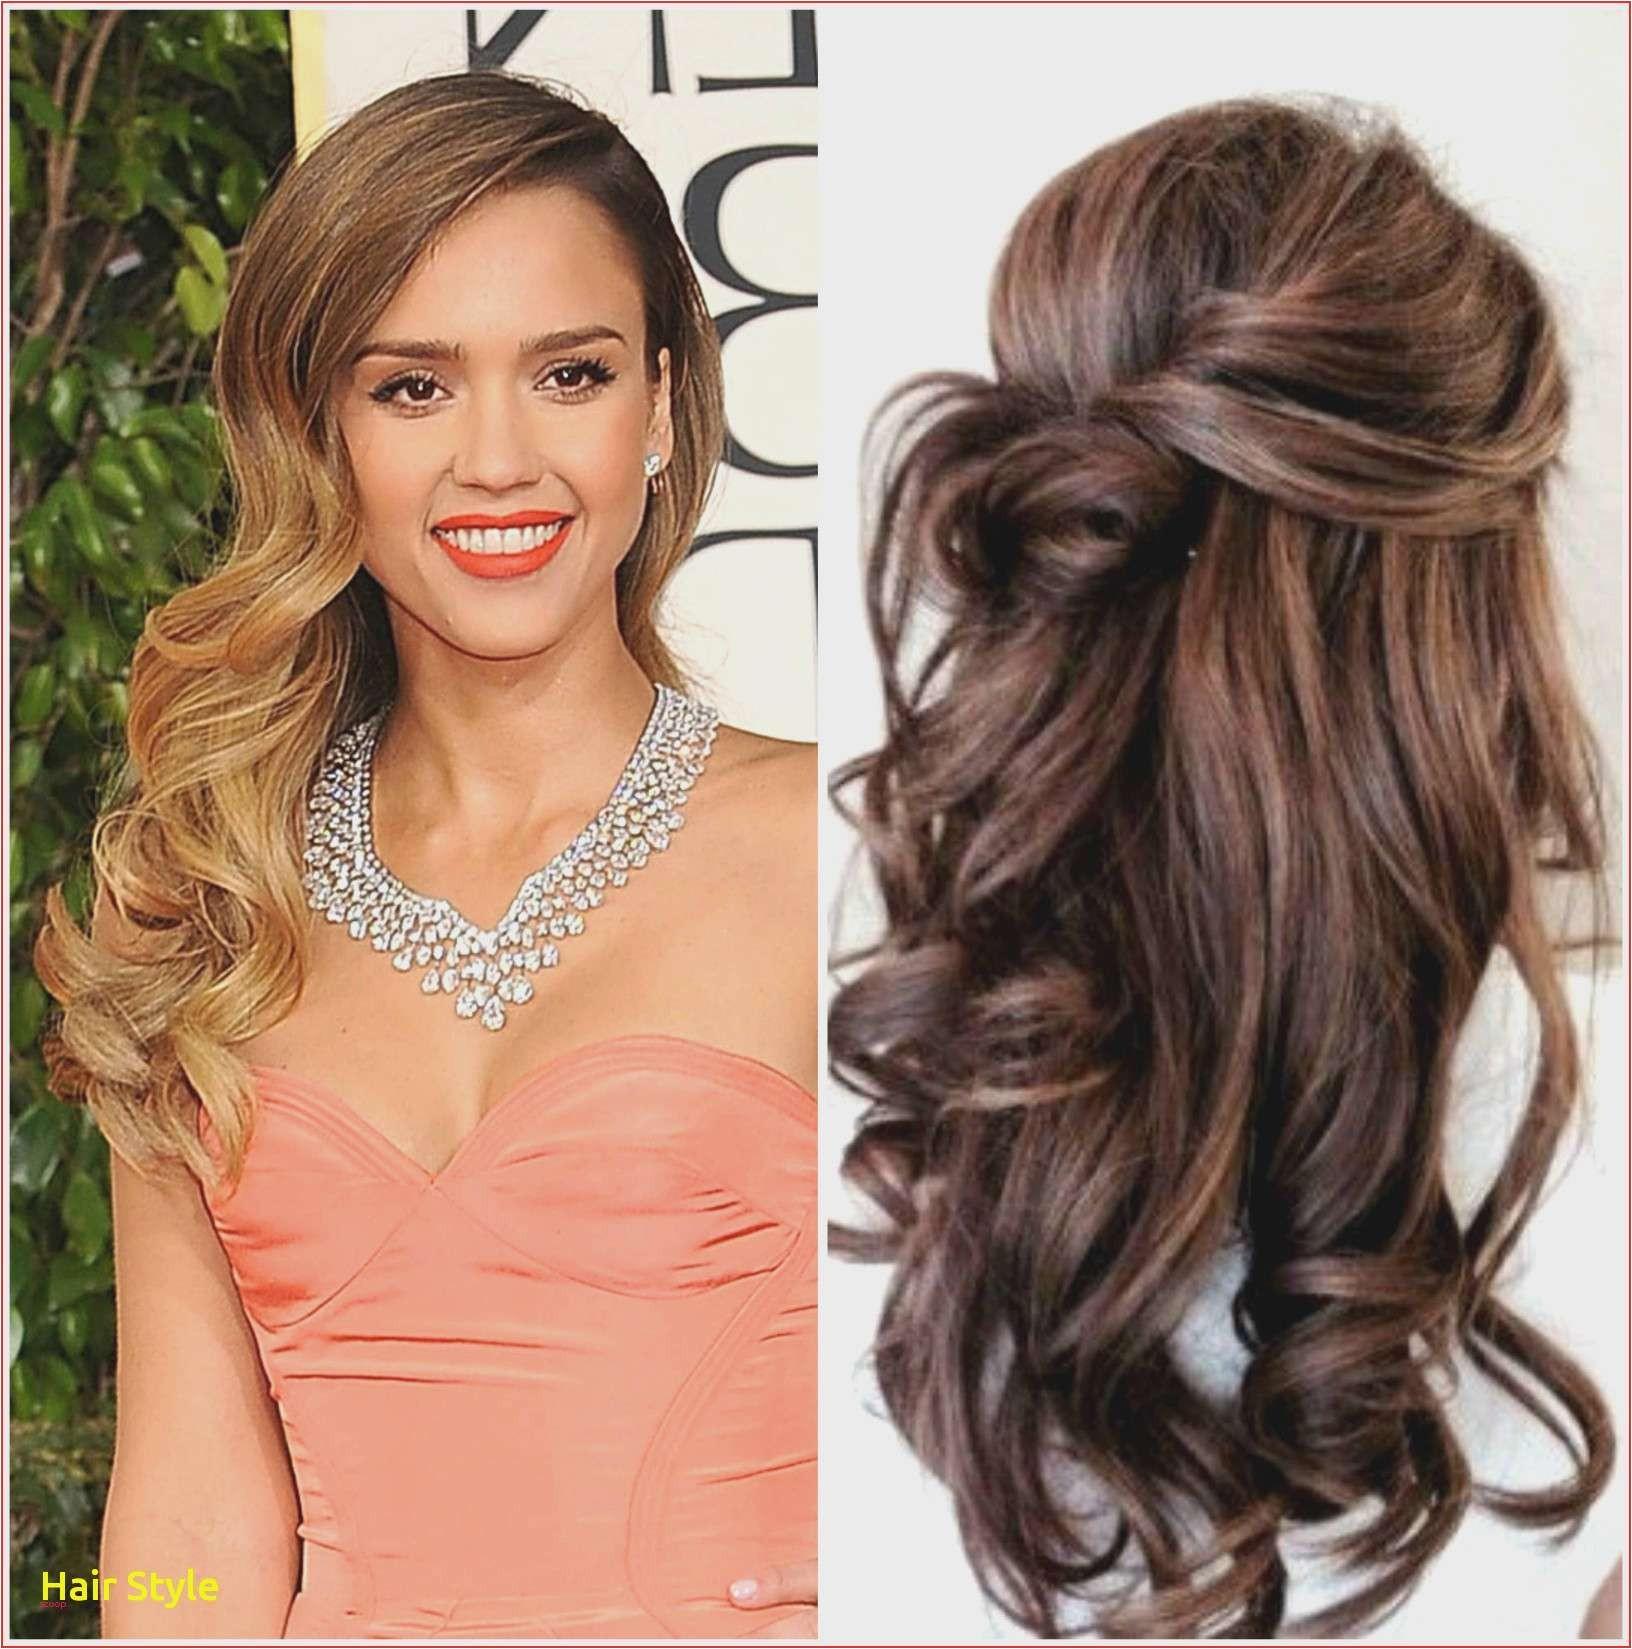 hairstyle for medium hair fancy medium hairstyles for girls hairstyle for medium hair 0d